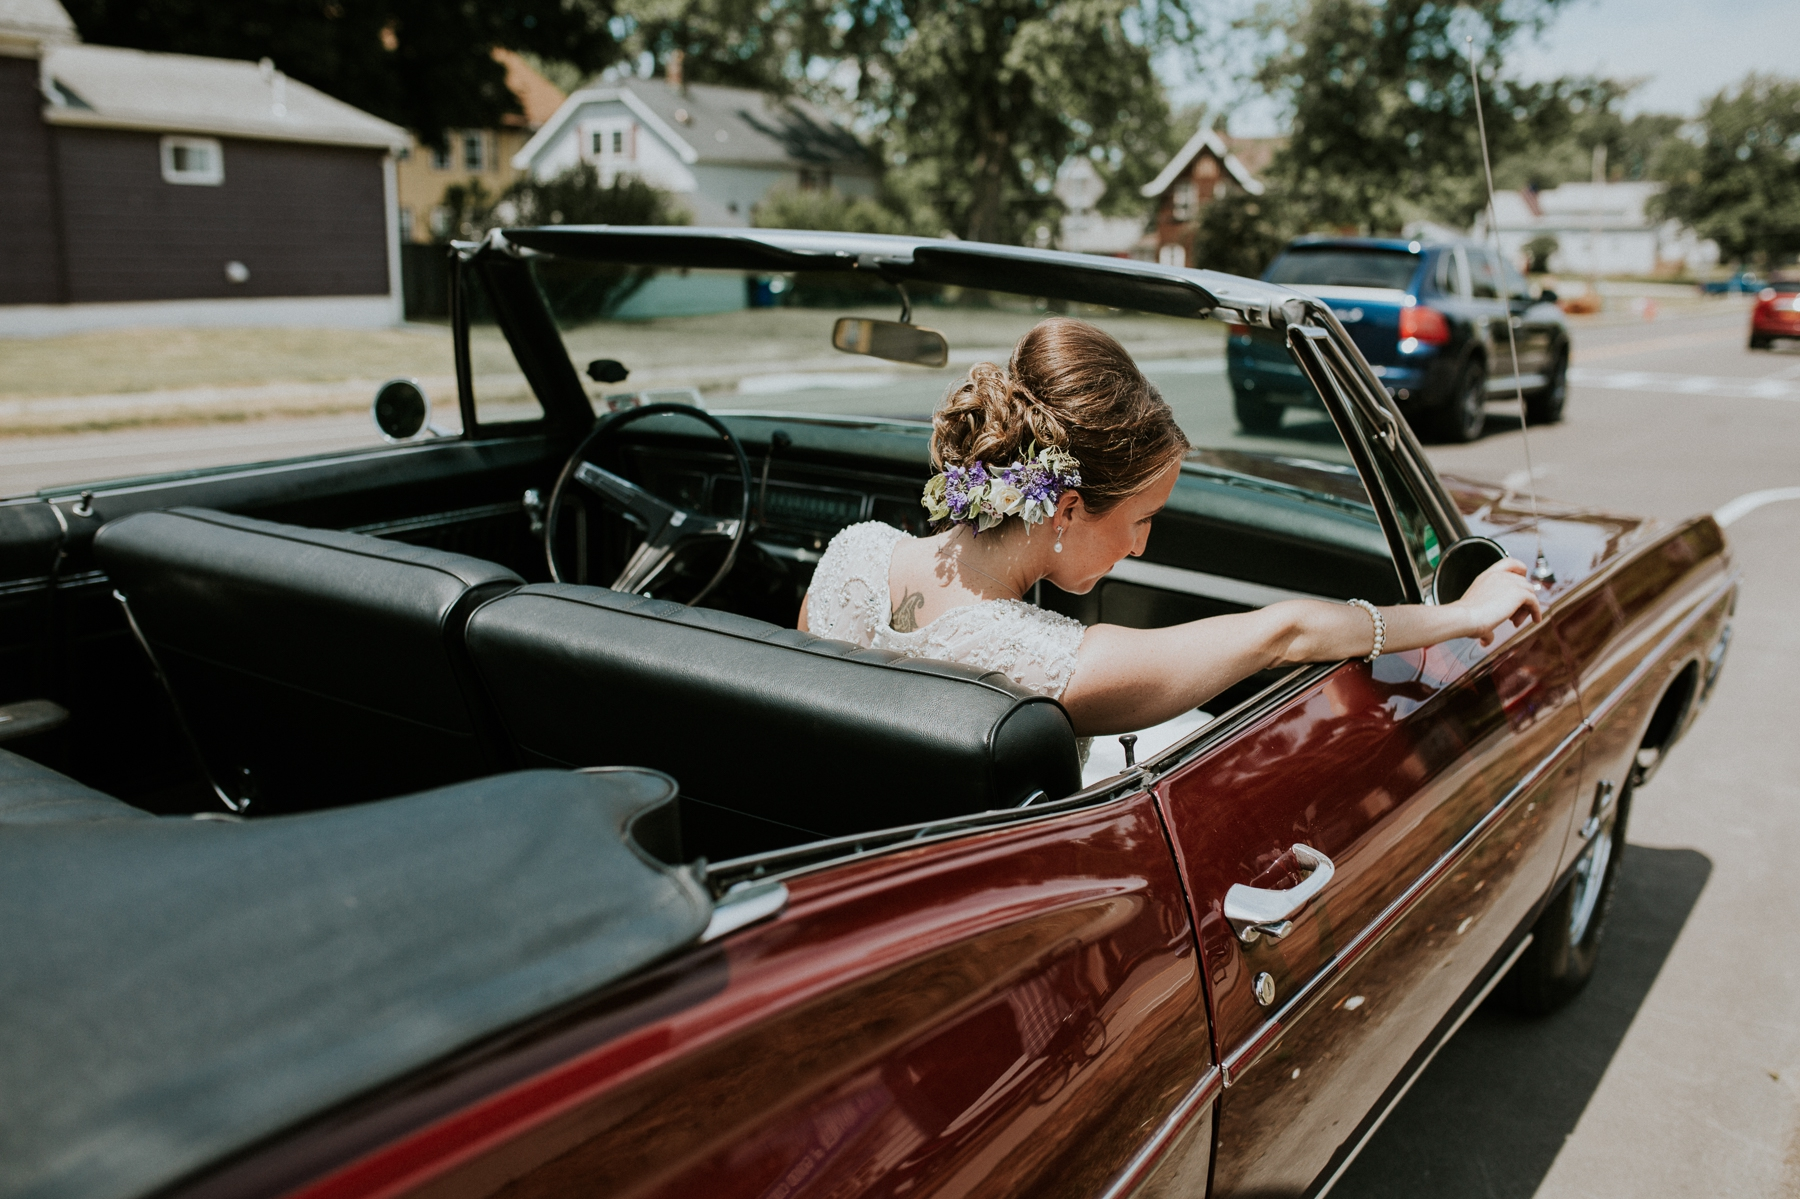 buffalo-new-york-hamburg-beach-wedding-photography 38.jpg